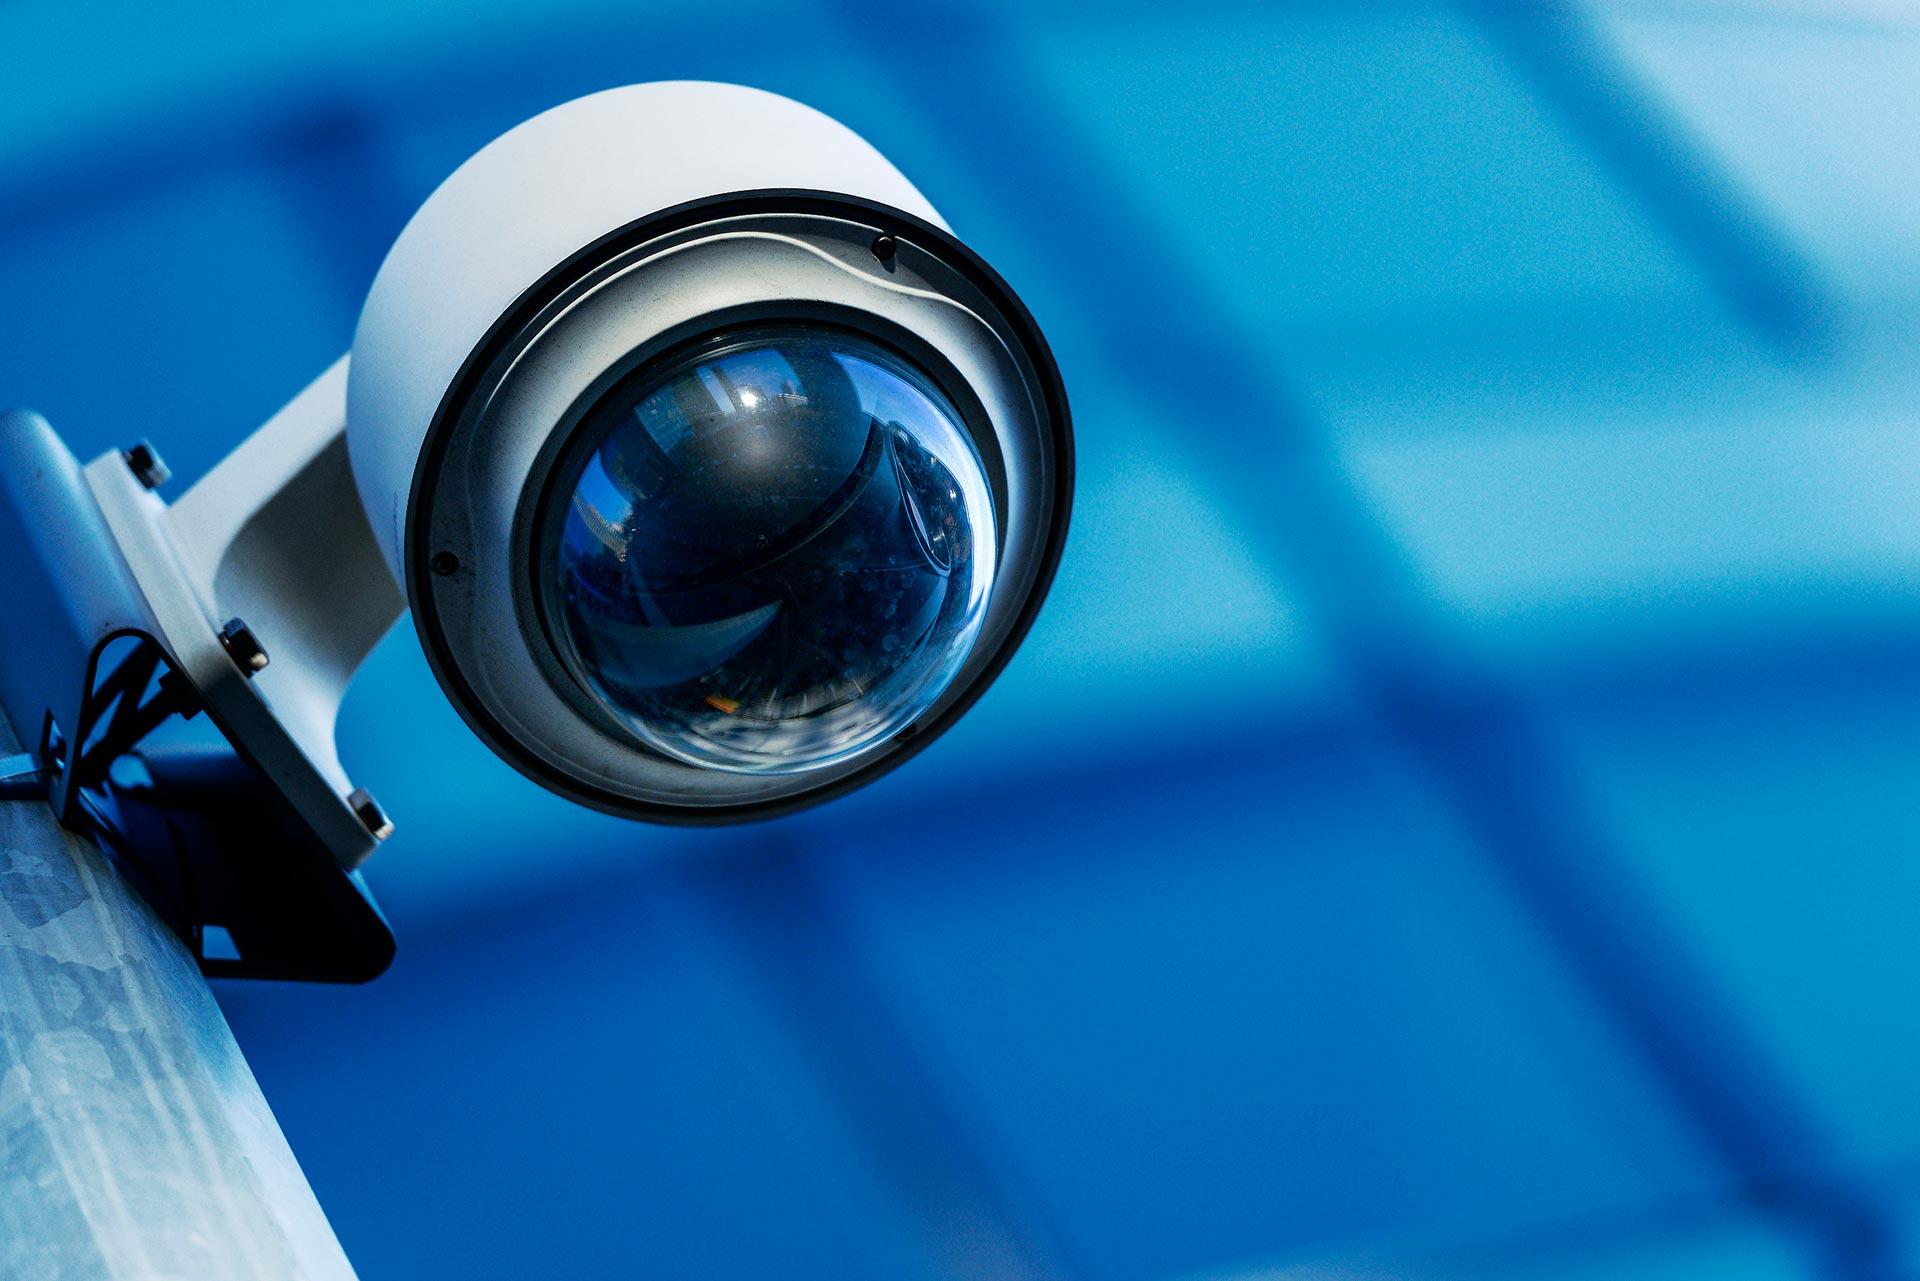 DM-IRCAM60 atrapa (maketa) vnitřní polokulovité kamery s LED